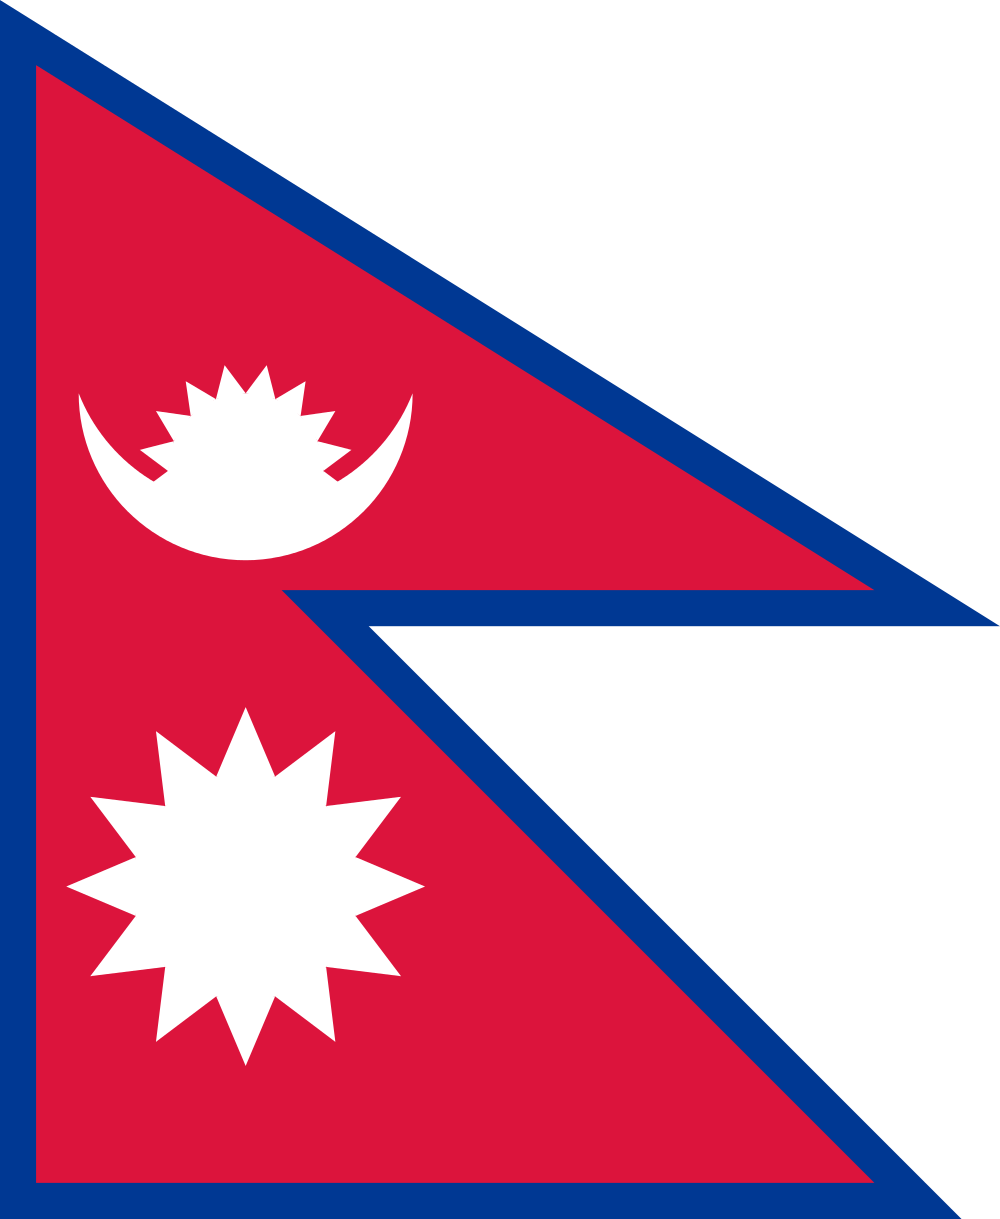 http://carbrandsincurrentproduction.blogspot.com.es/search/label/Nepal